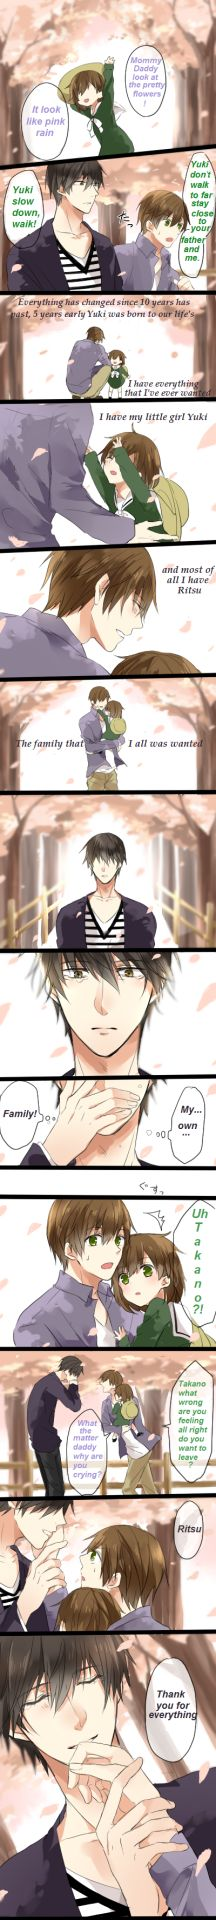 Ritsu x Takano Comic Credit goes to original artist